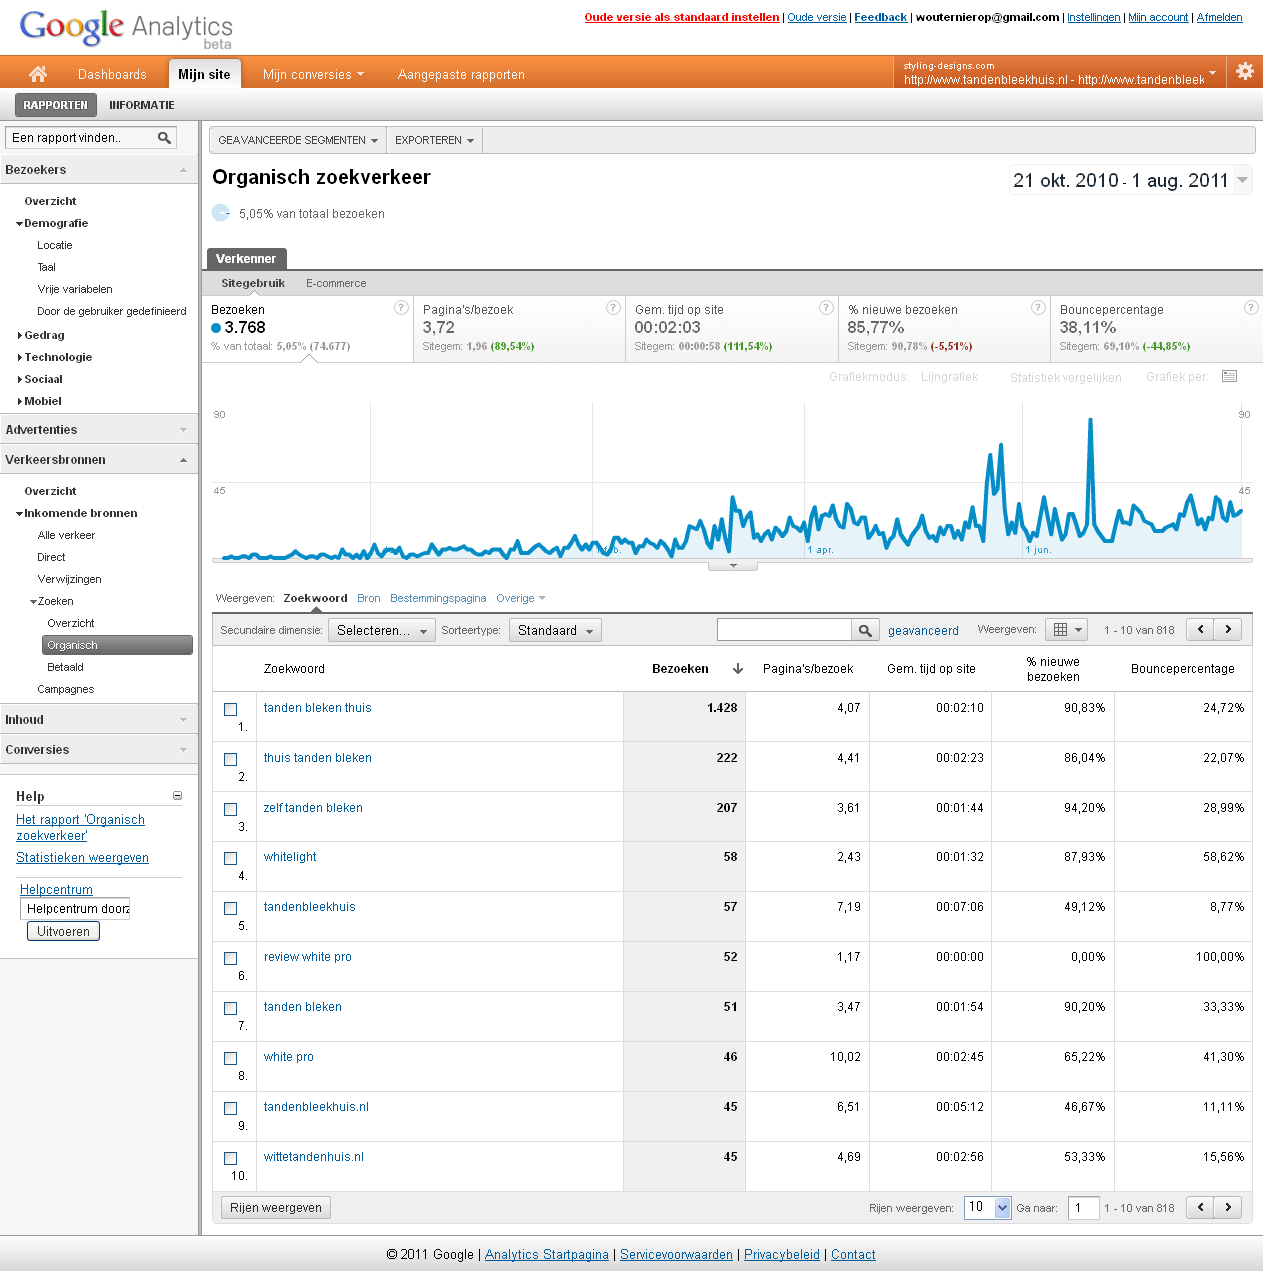 tandenbleekhuis keyword natural search google analytics